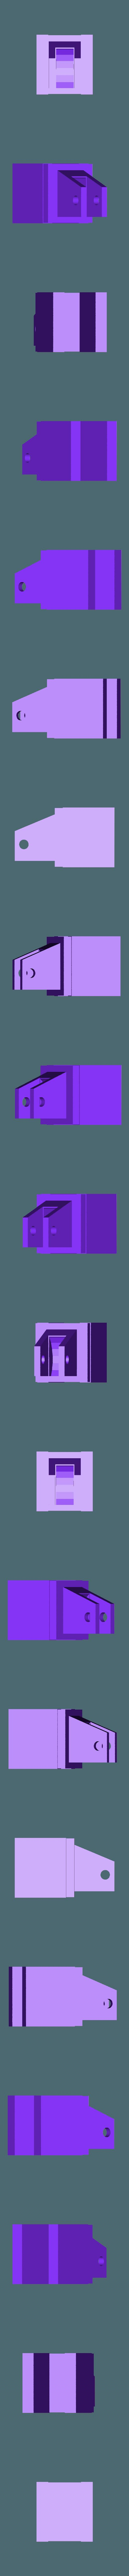 wheelhousing.stl Download free STL file Apollo F1 Rocket Engine on Stand • 3D print object, monsenrm